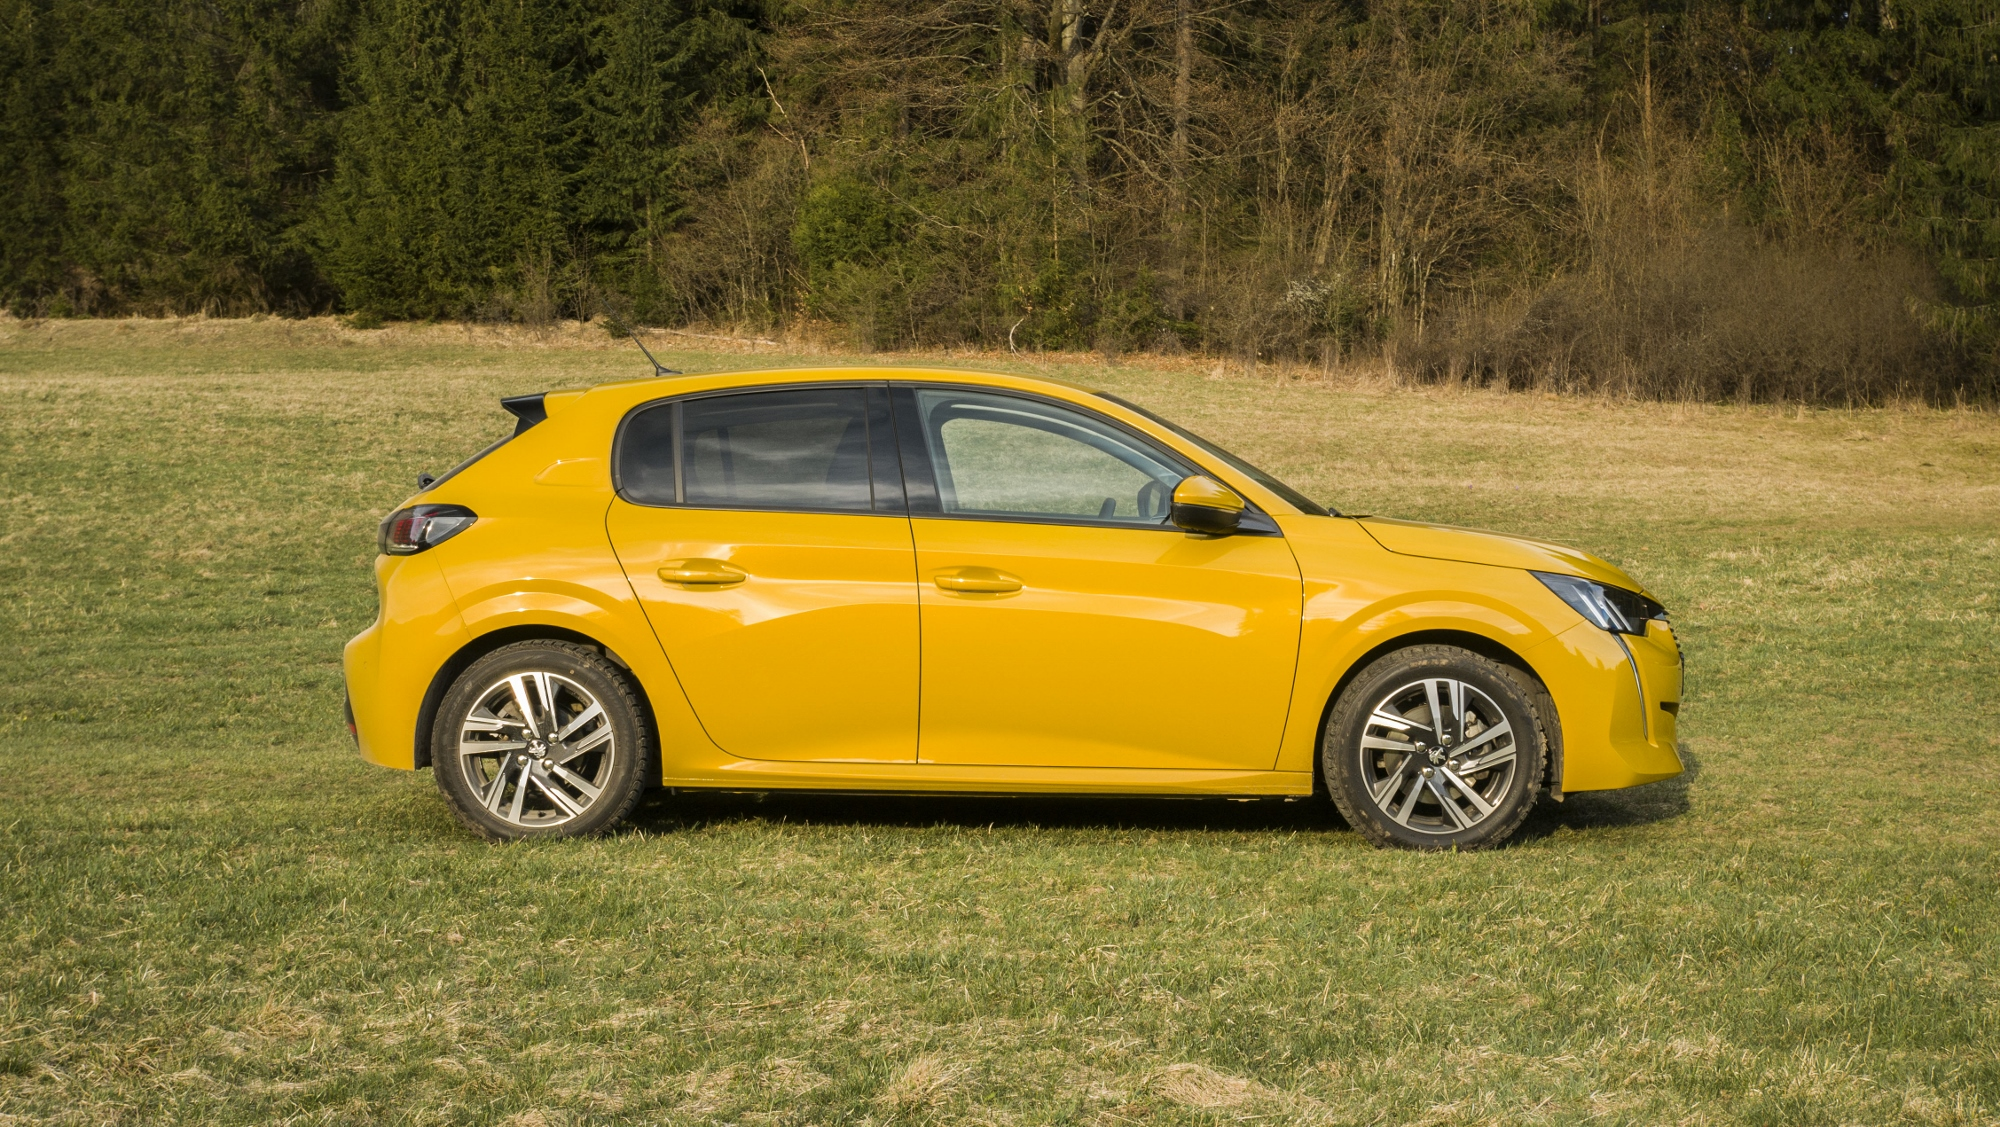 Test: Peugeot 208 prekvapivo pútal pohľady WJSQbzPnMT peugeot-208-3